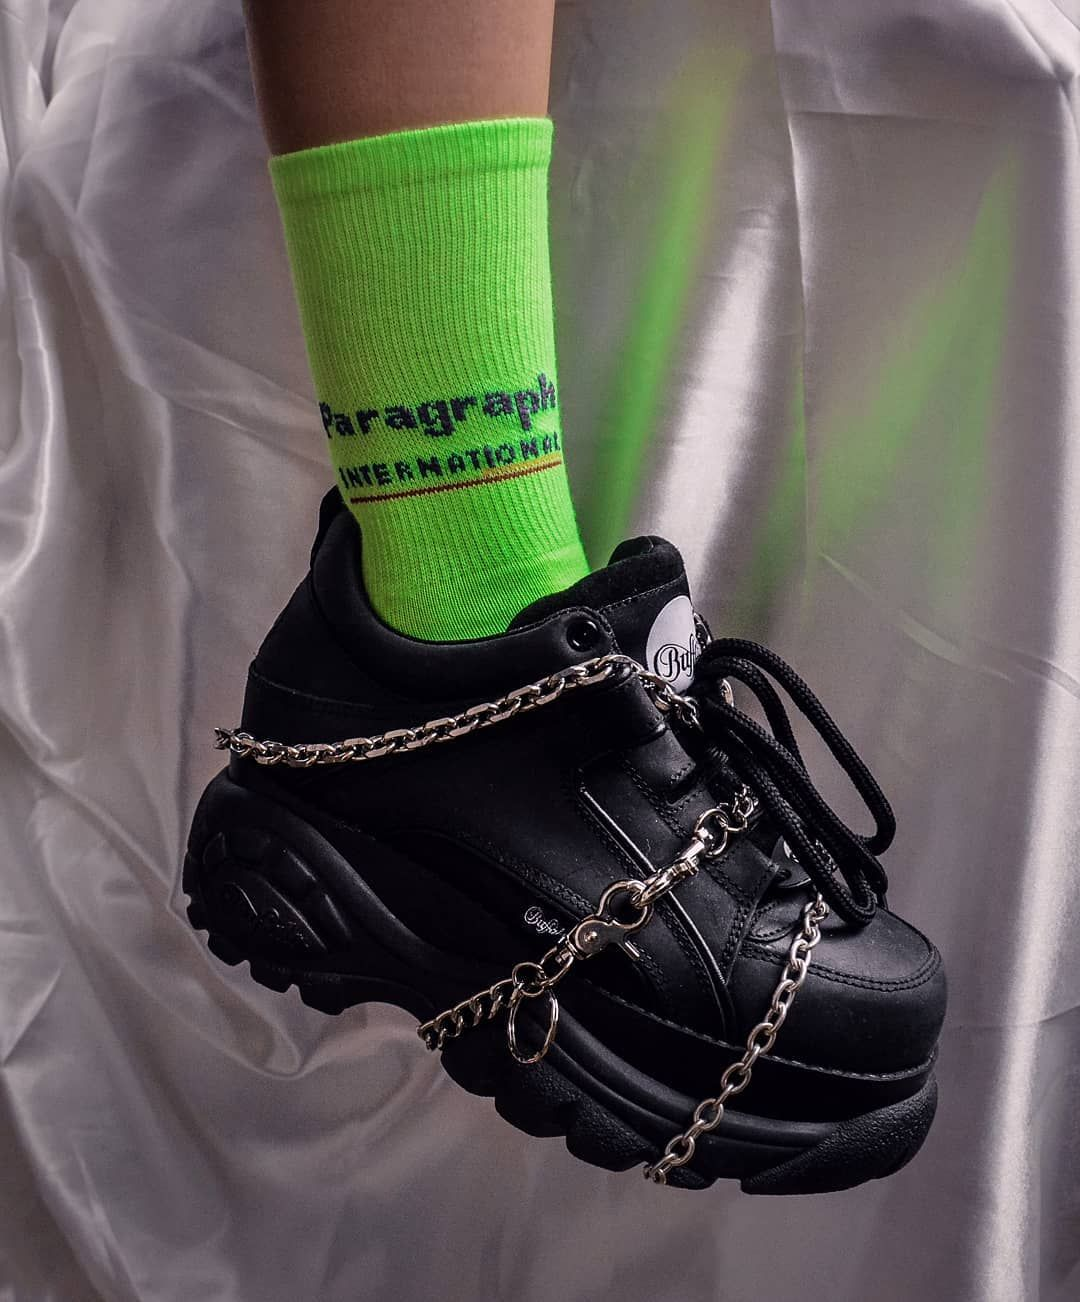 18c171cfe92e7d 90 s Style Buffalo Schuhe mit Ketten und neon Socken   Buffalo Classic  Boots    buffaloclassics  schuhe  90sfashion  90sstyle  buffaloshoes   neongreen